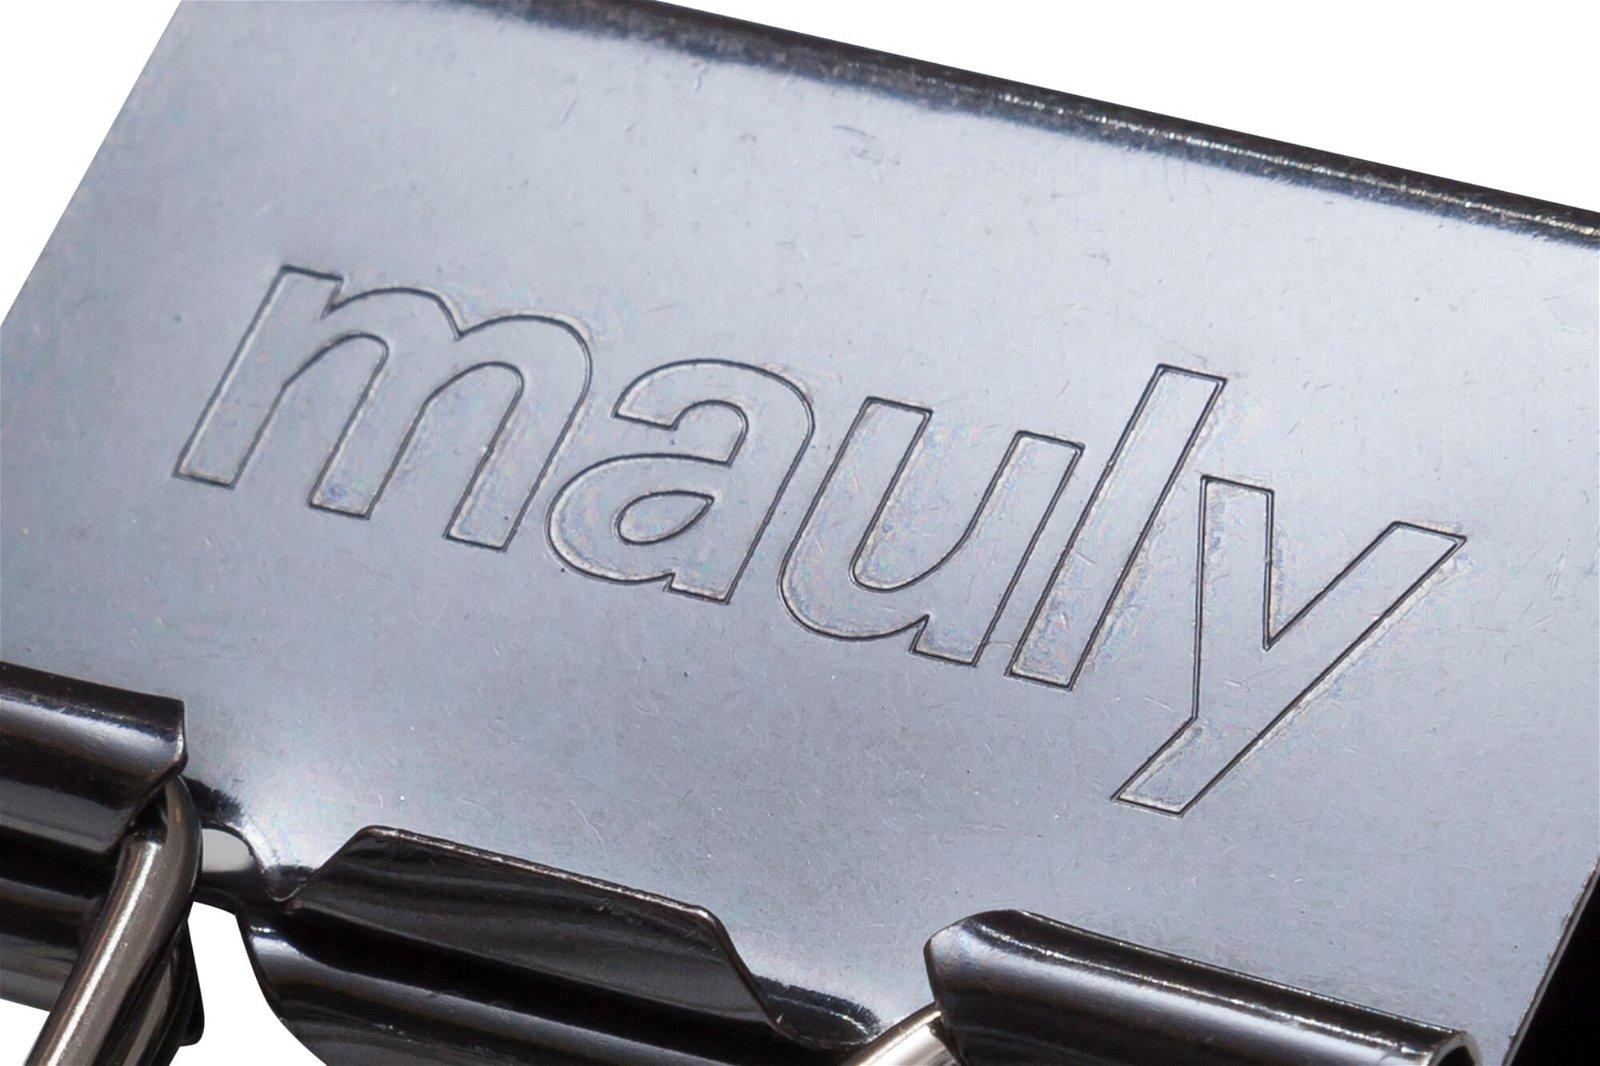 mauly 215, Breite 51 mm, 6 St./Btl., schwarz